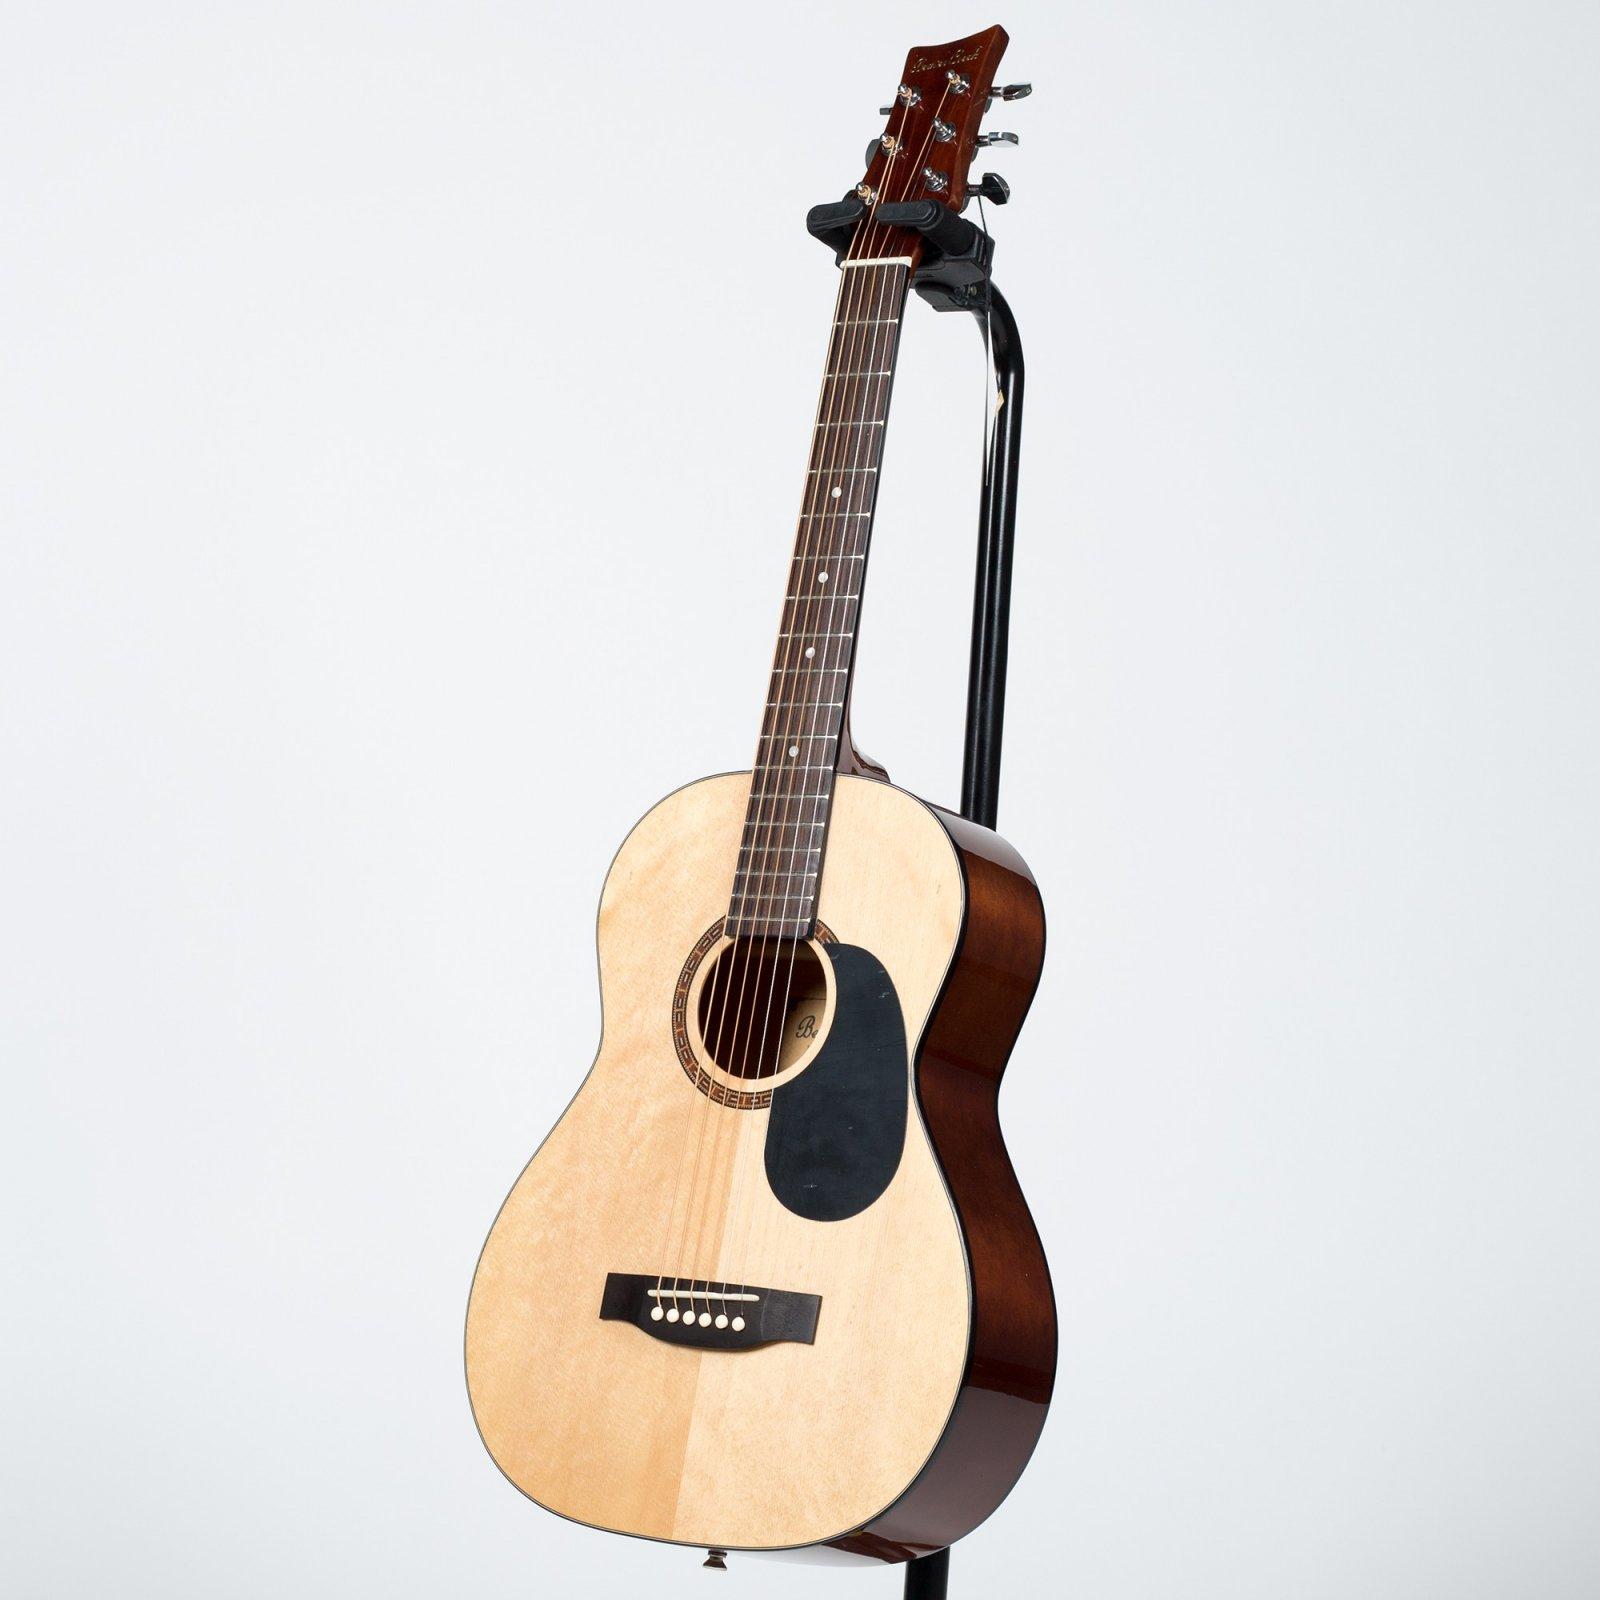 BEAVER CREEK 601 Series - 3/4 Size Acoustic